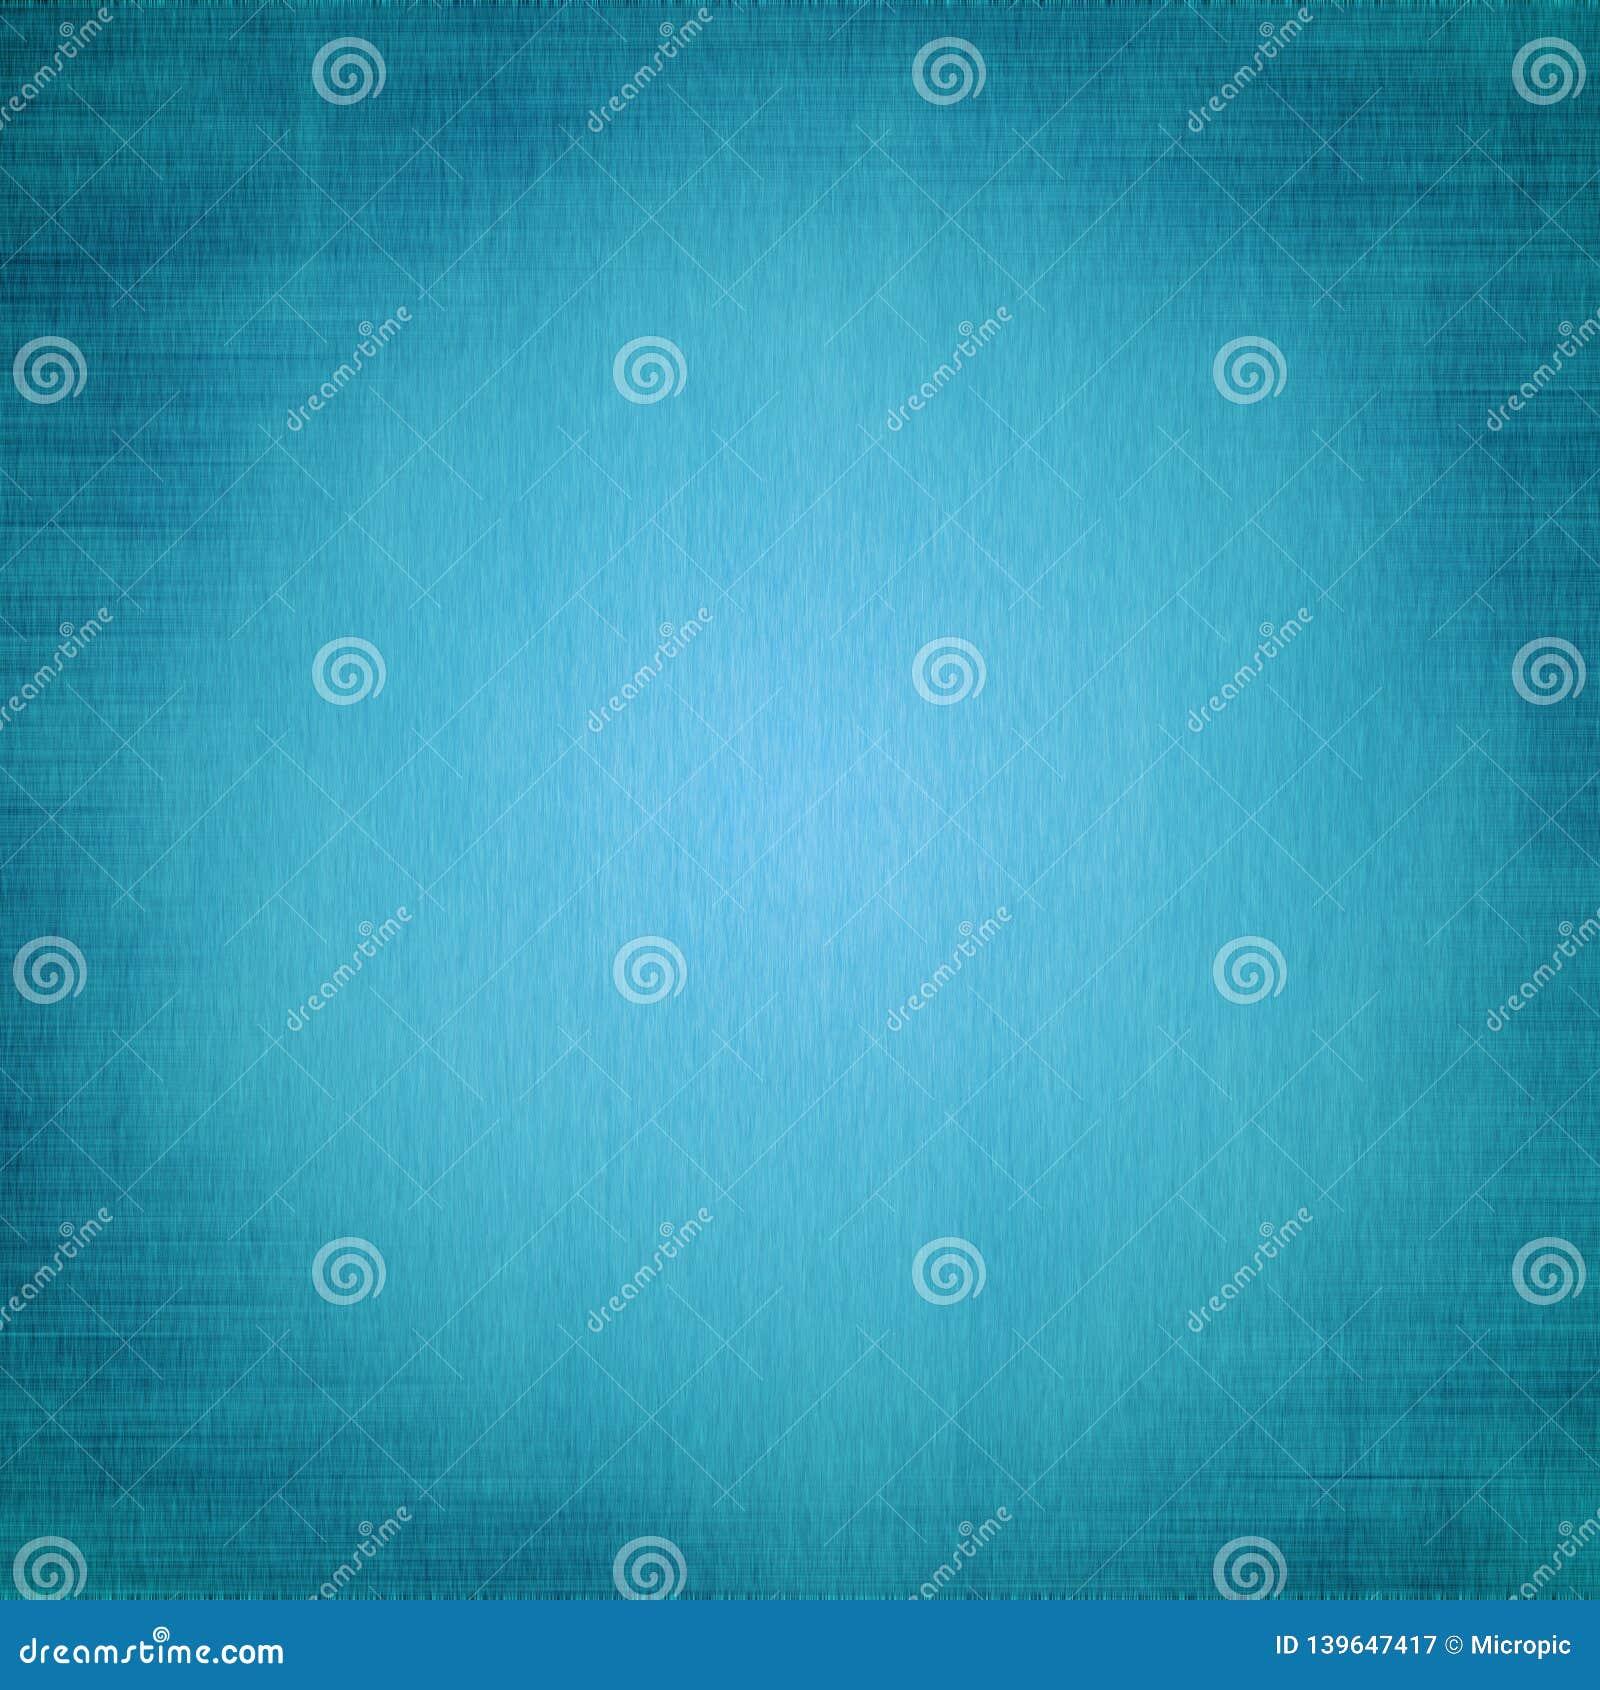 Sky blue Grunge texture Background wallpaper